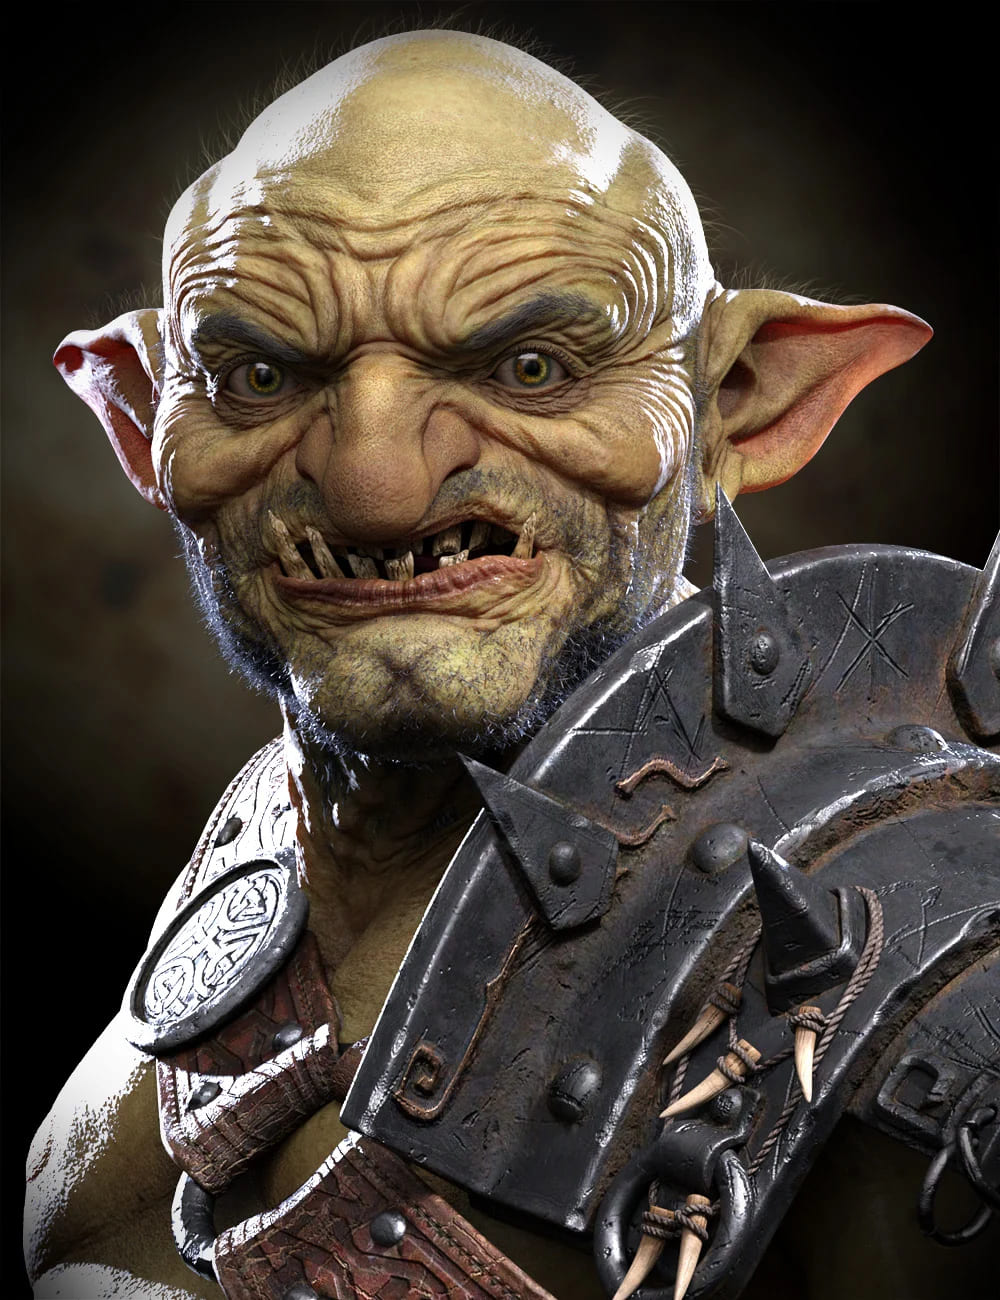 War Goblin HD for Genesis 8.1 Male_DAZ3D下载站